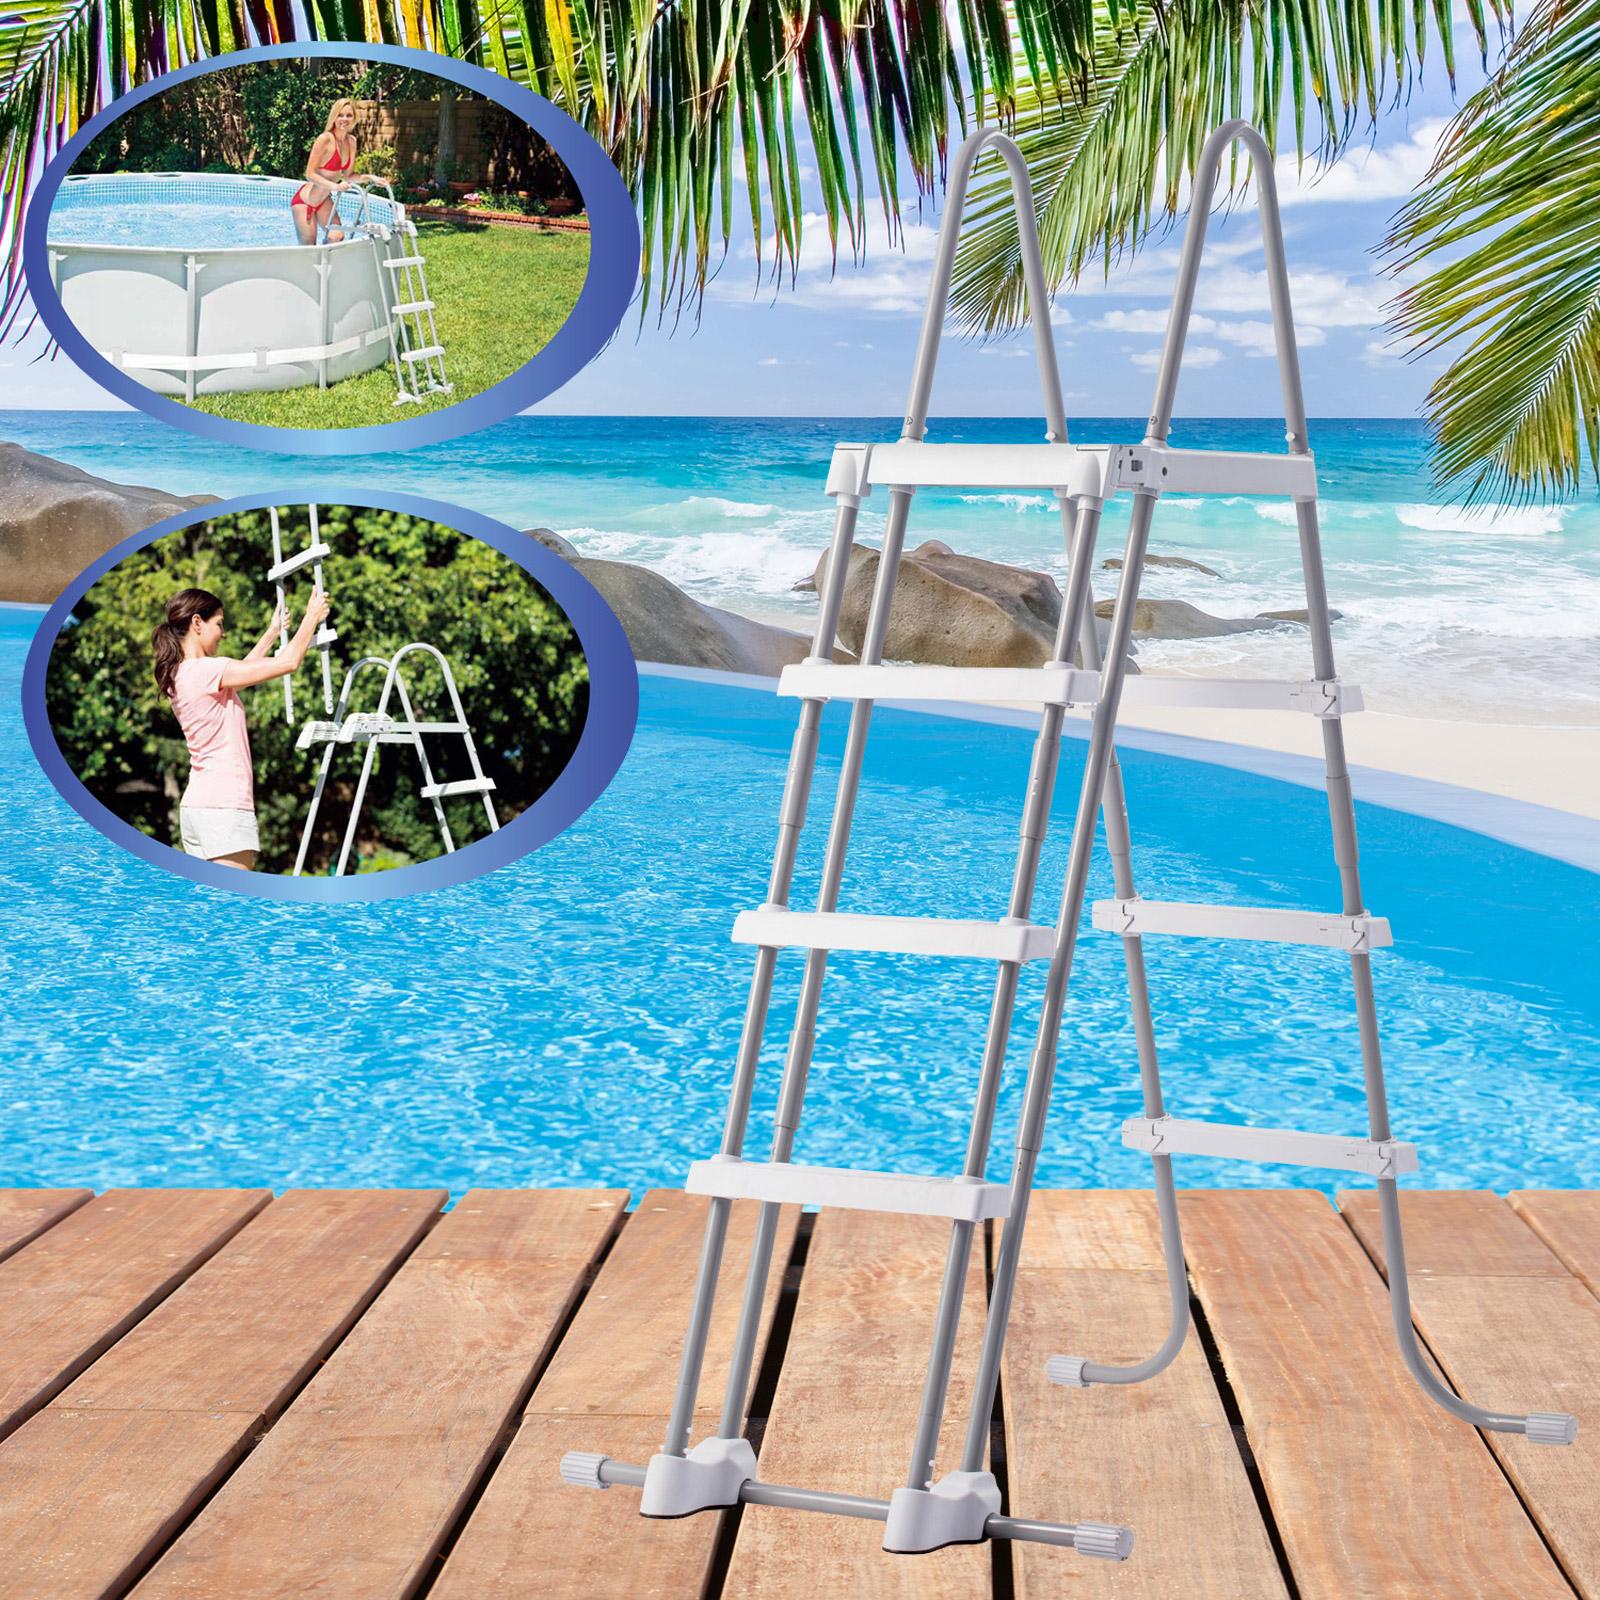 intex swimming pool frame 457x122 cm mit sandfilter. Black Bedroom Furniture Sets. Home Design Ideas